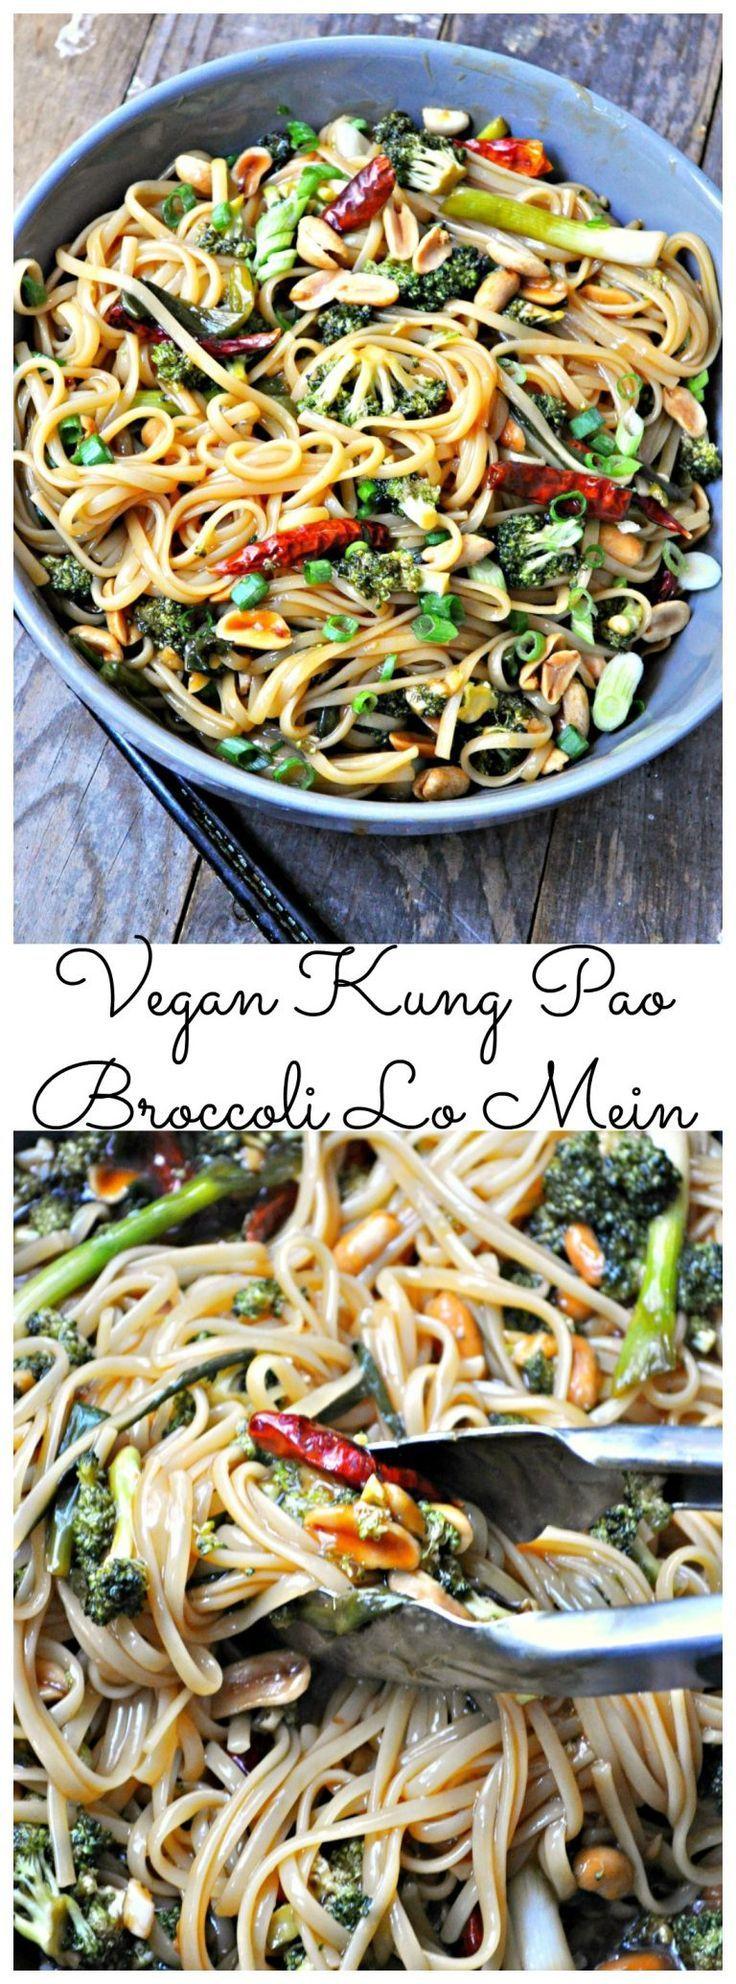 Vegan Kung Pao Broccoli Lo Mein